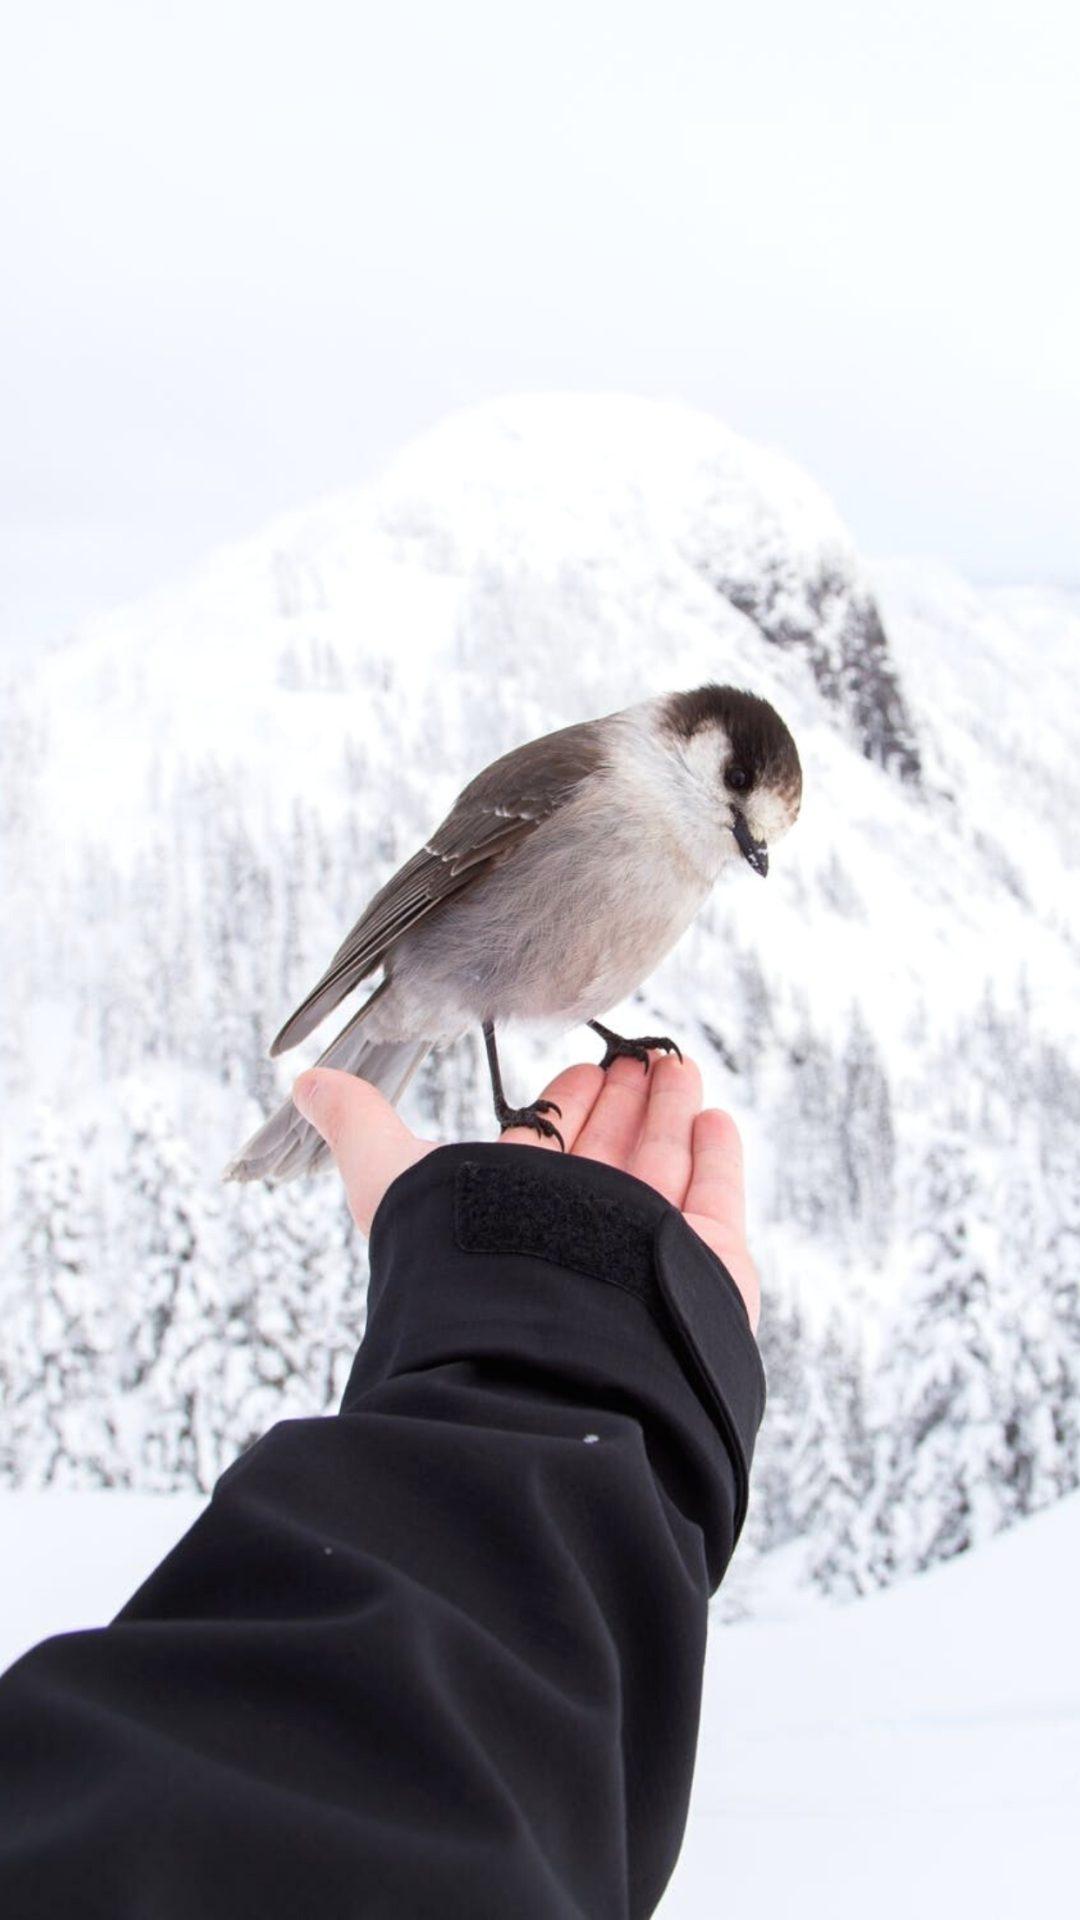 Beautiful Winter Wallpapers with animals (bird)